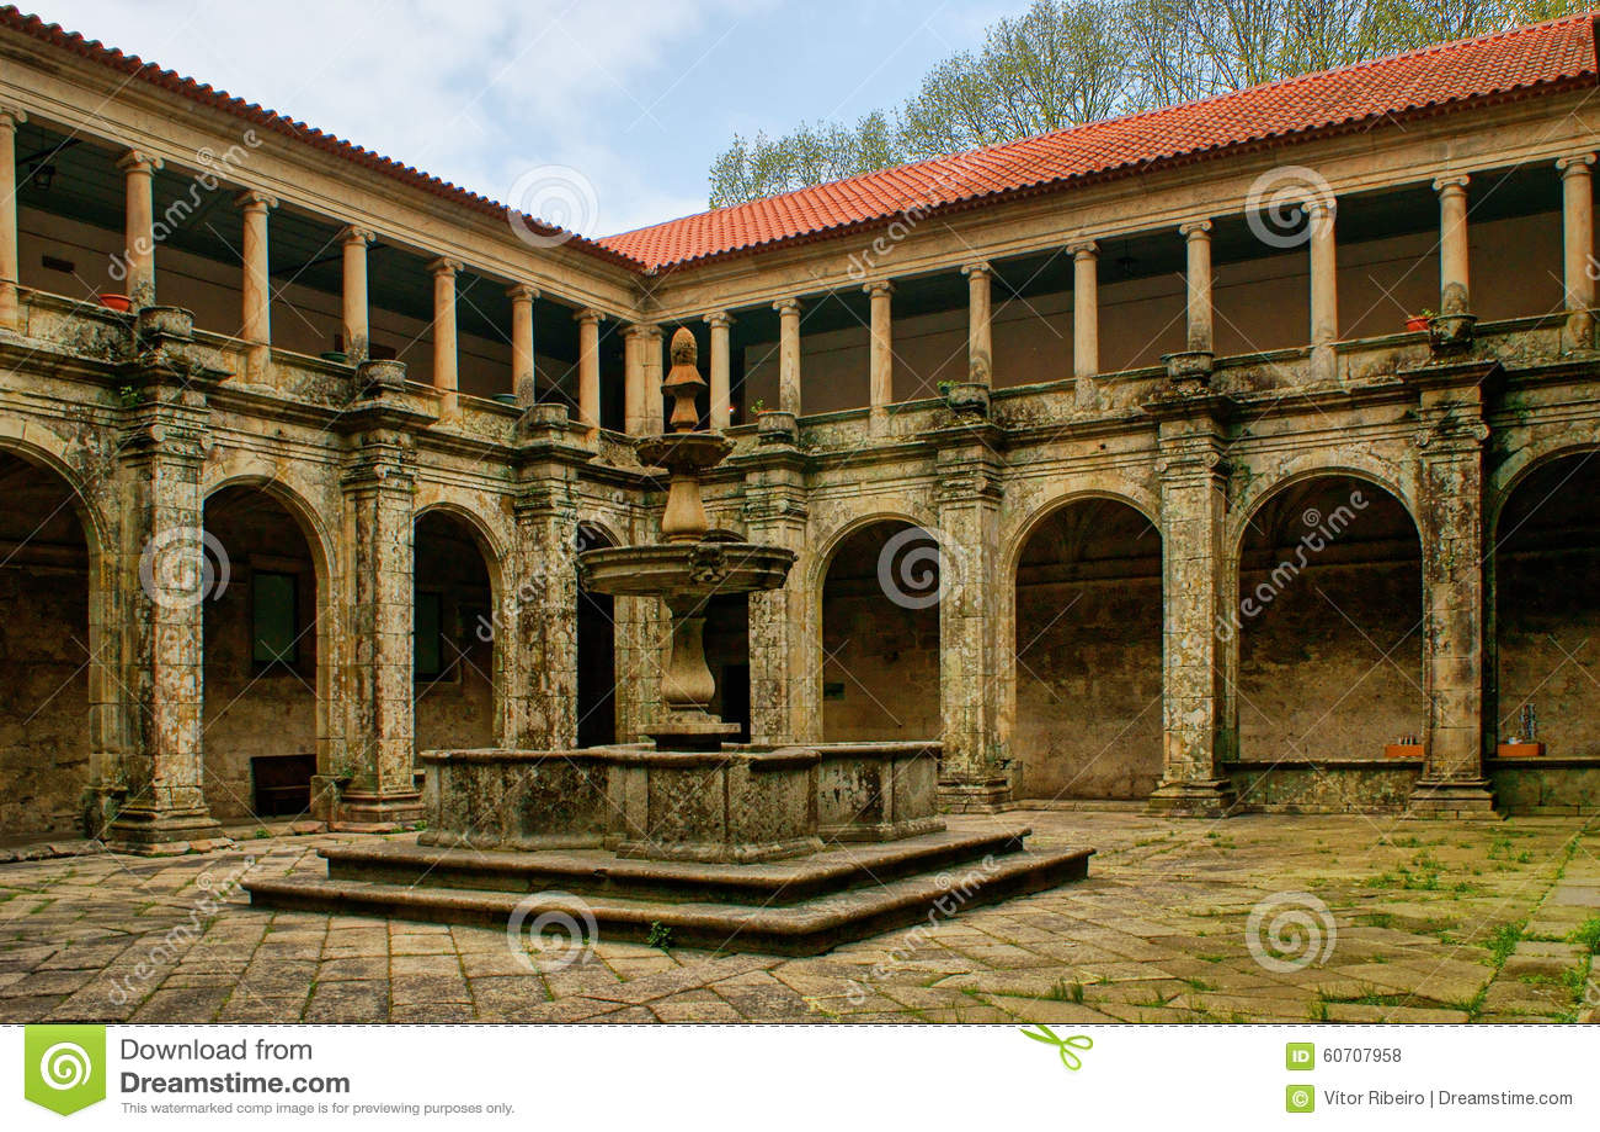 Cloister of Sao Goncalo monastery